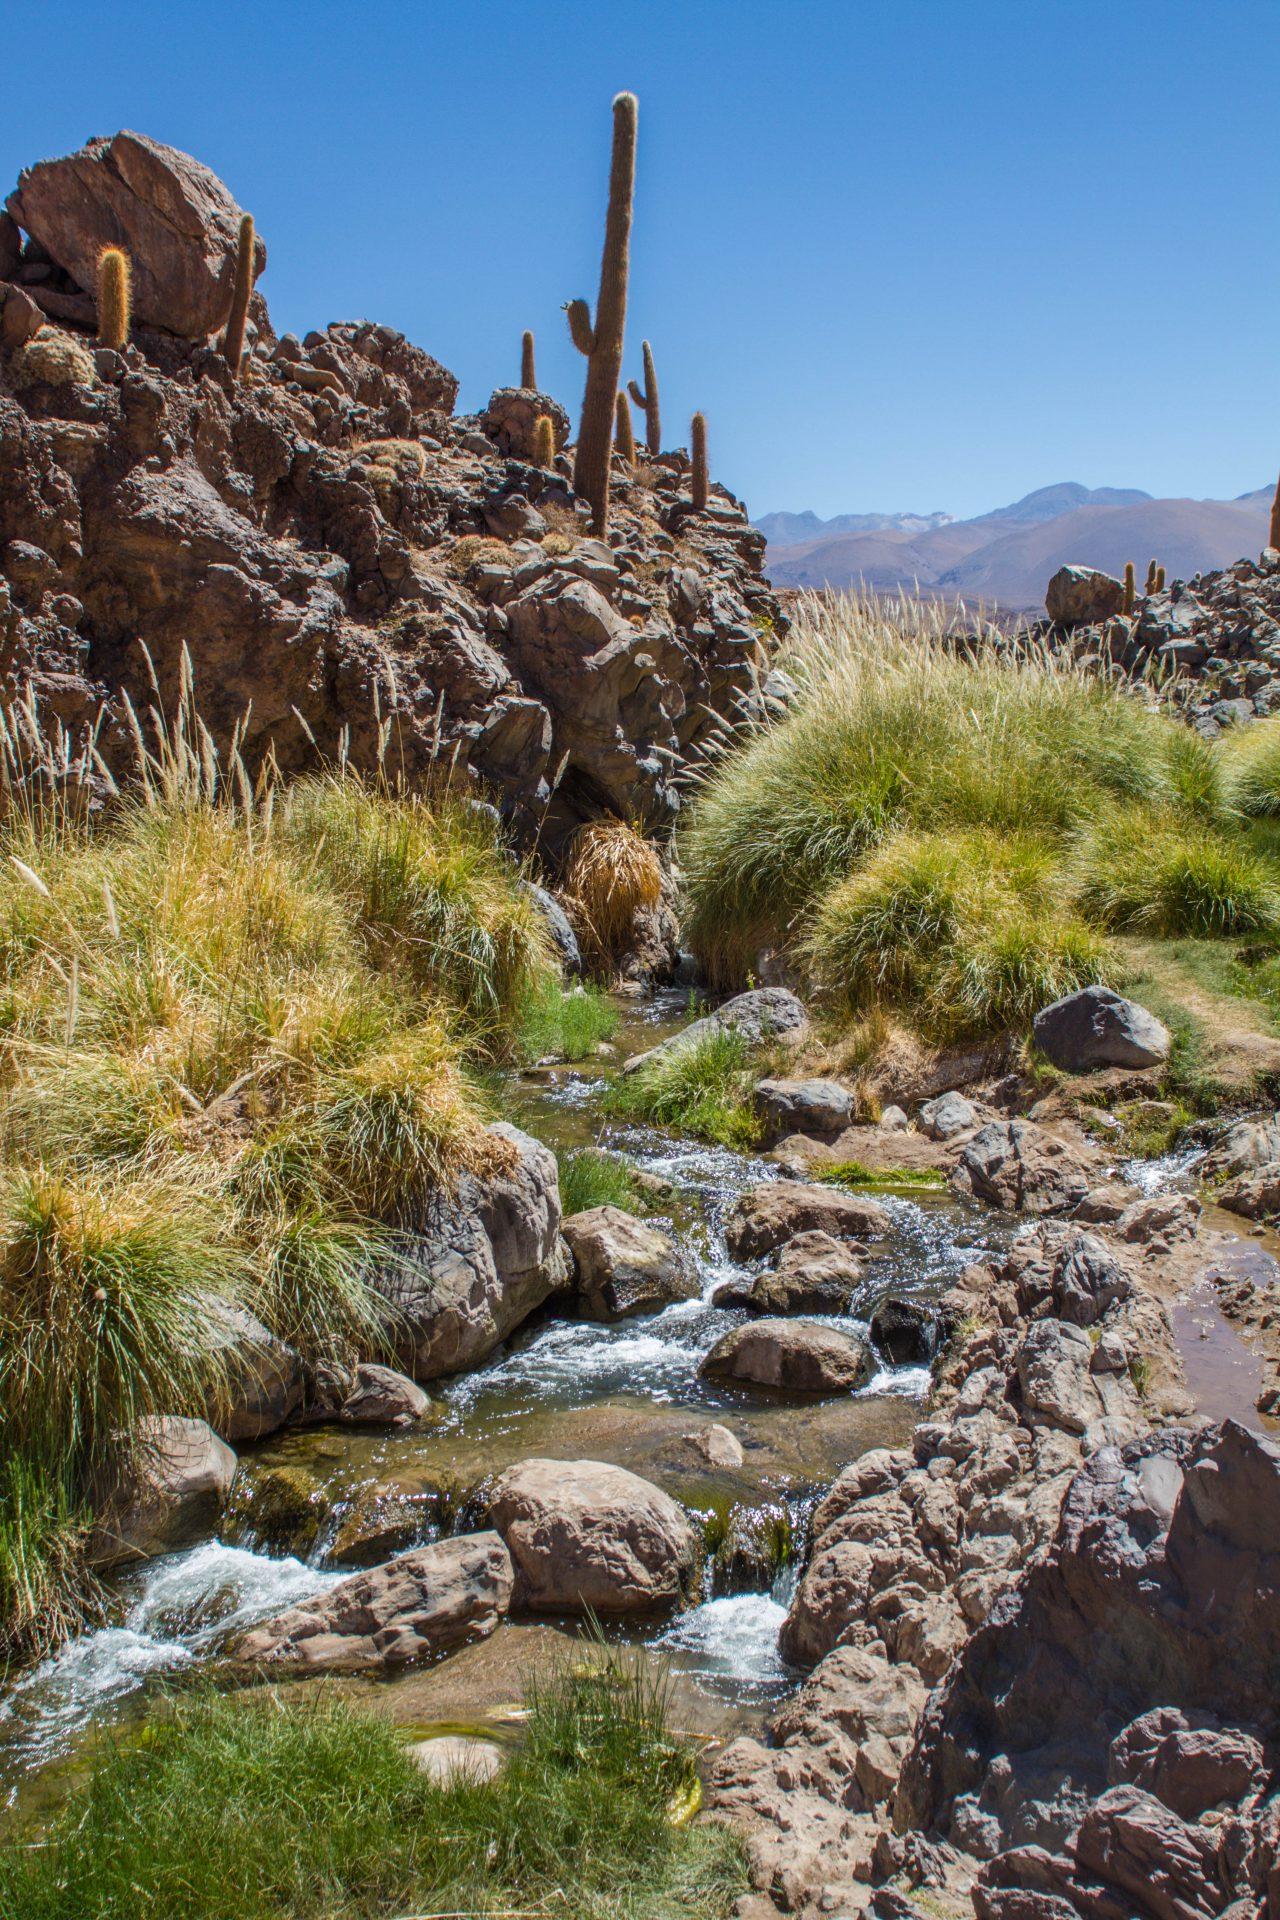 A river runs through the cactus forest.